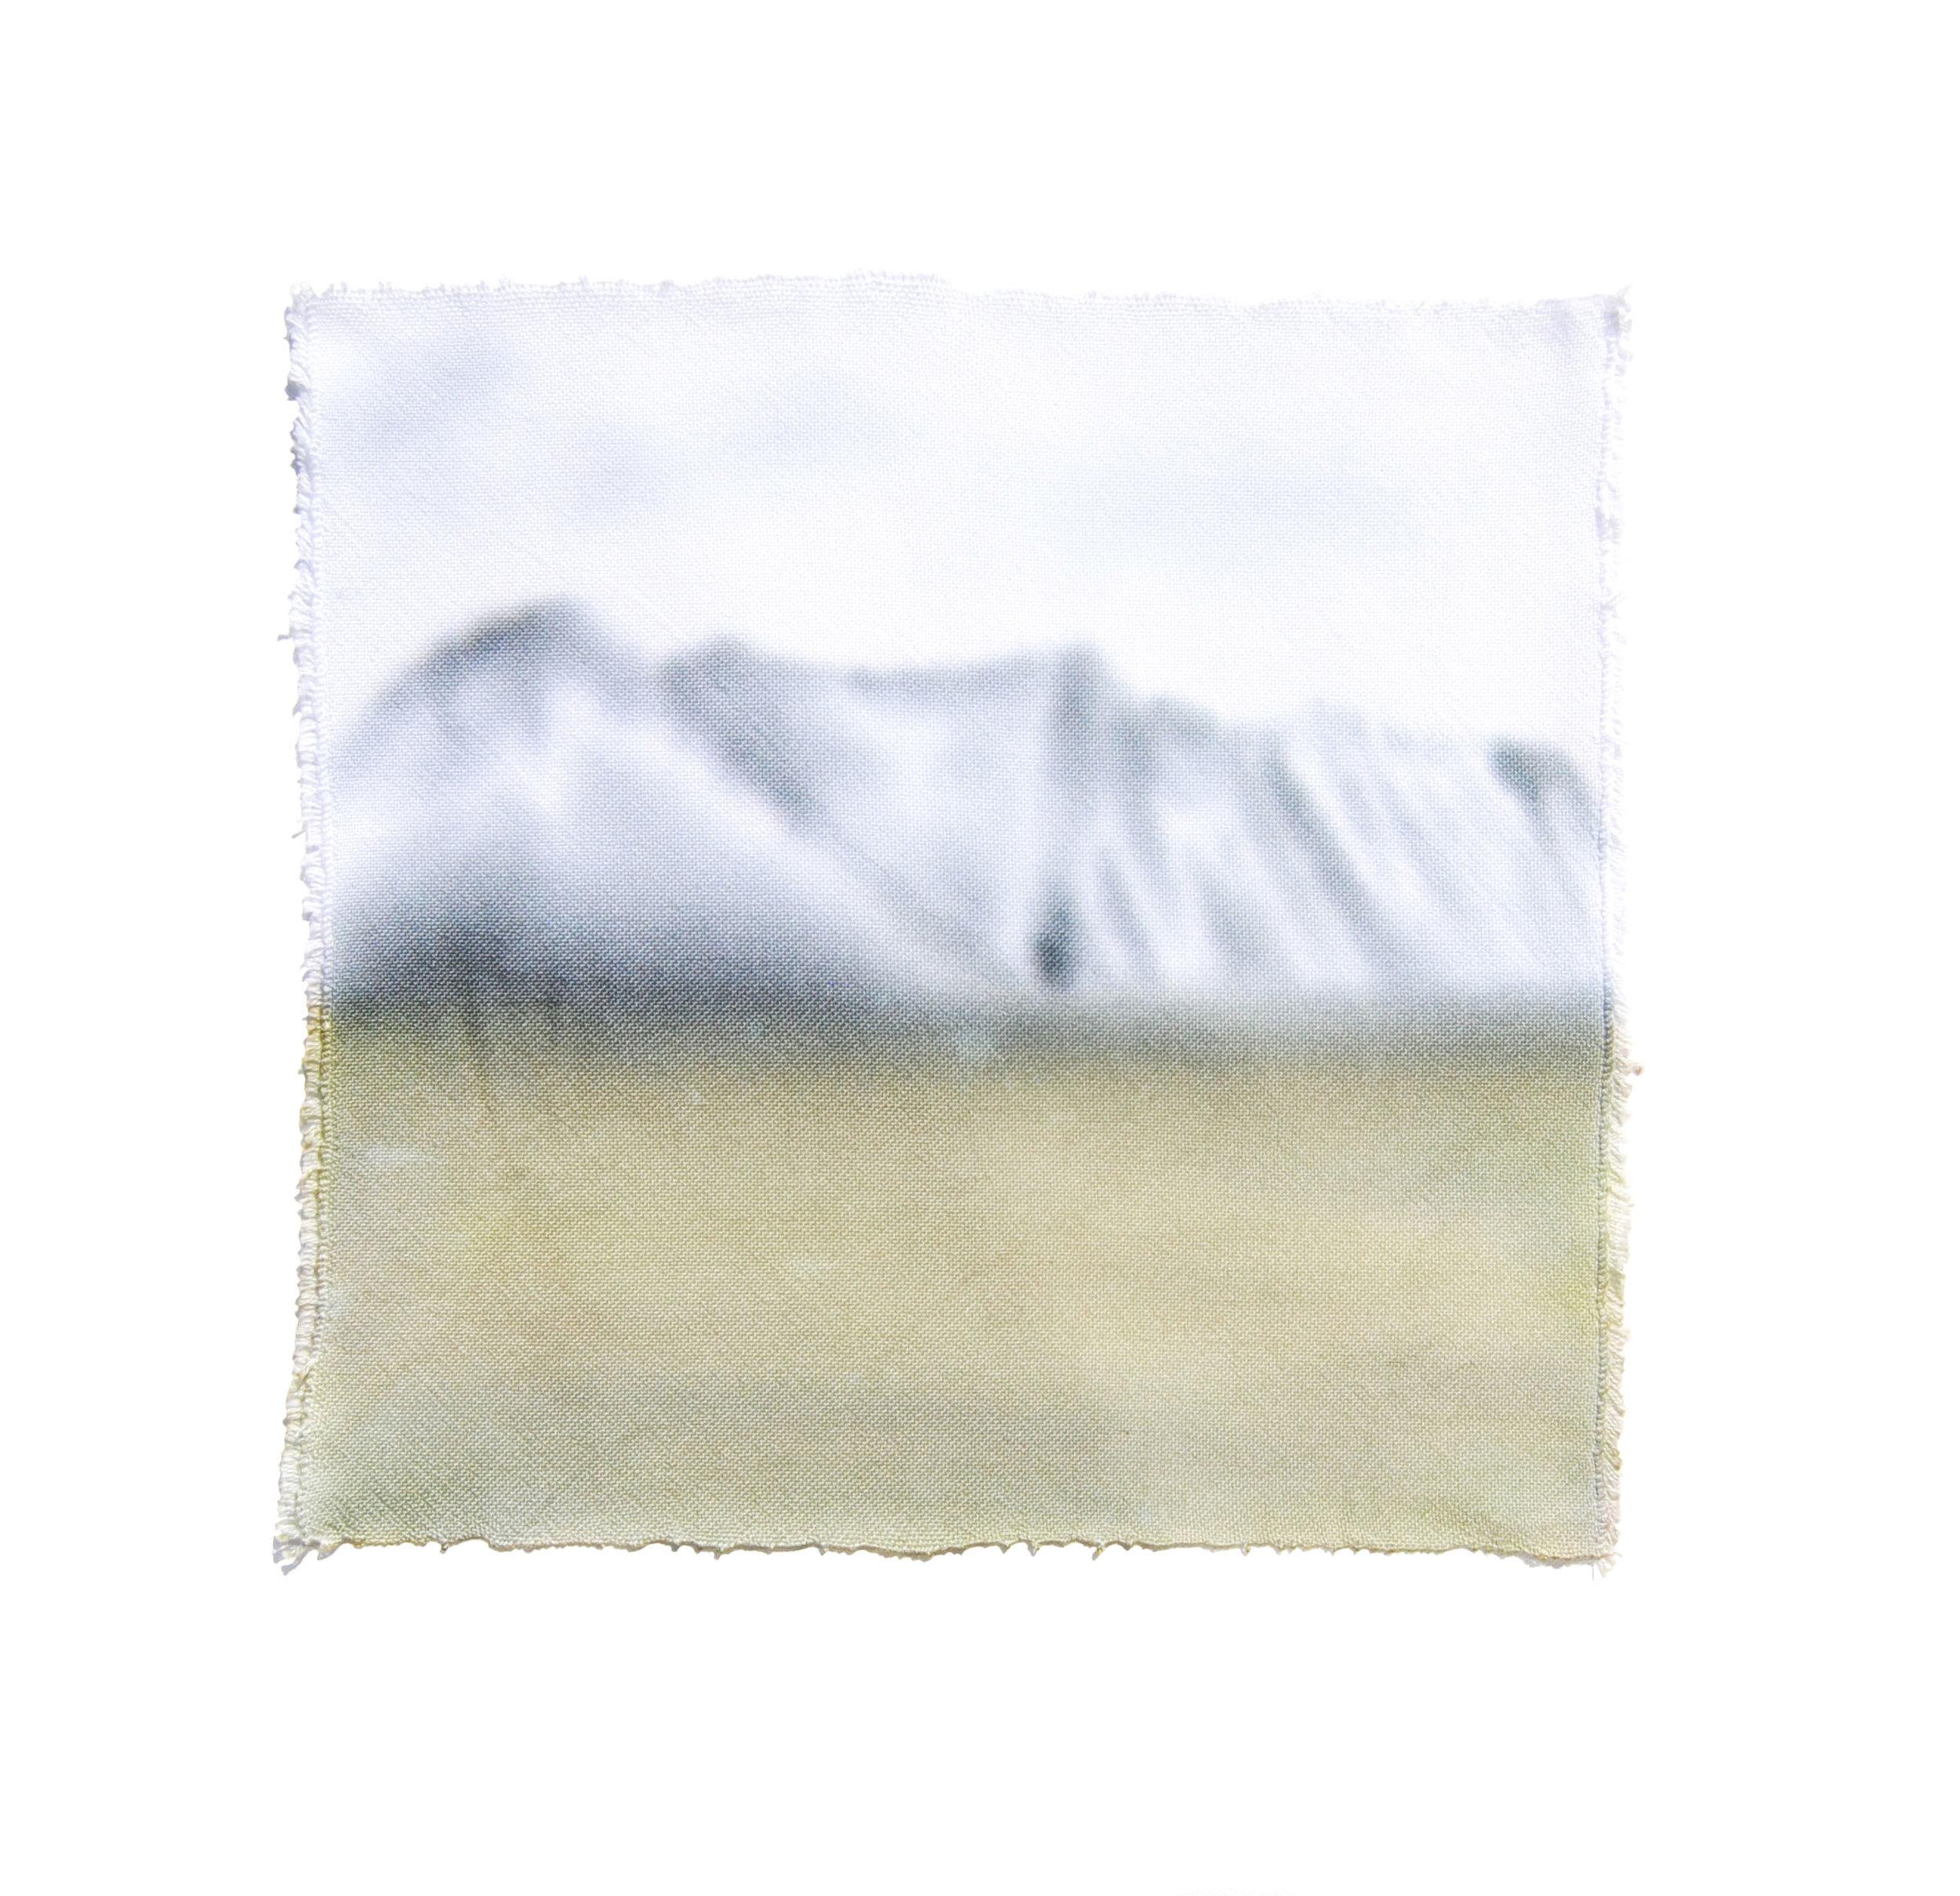 #7_layers.jpg